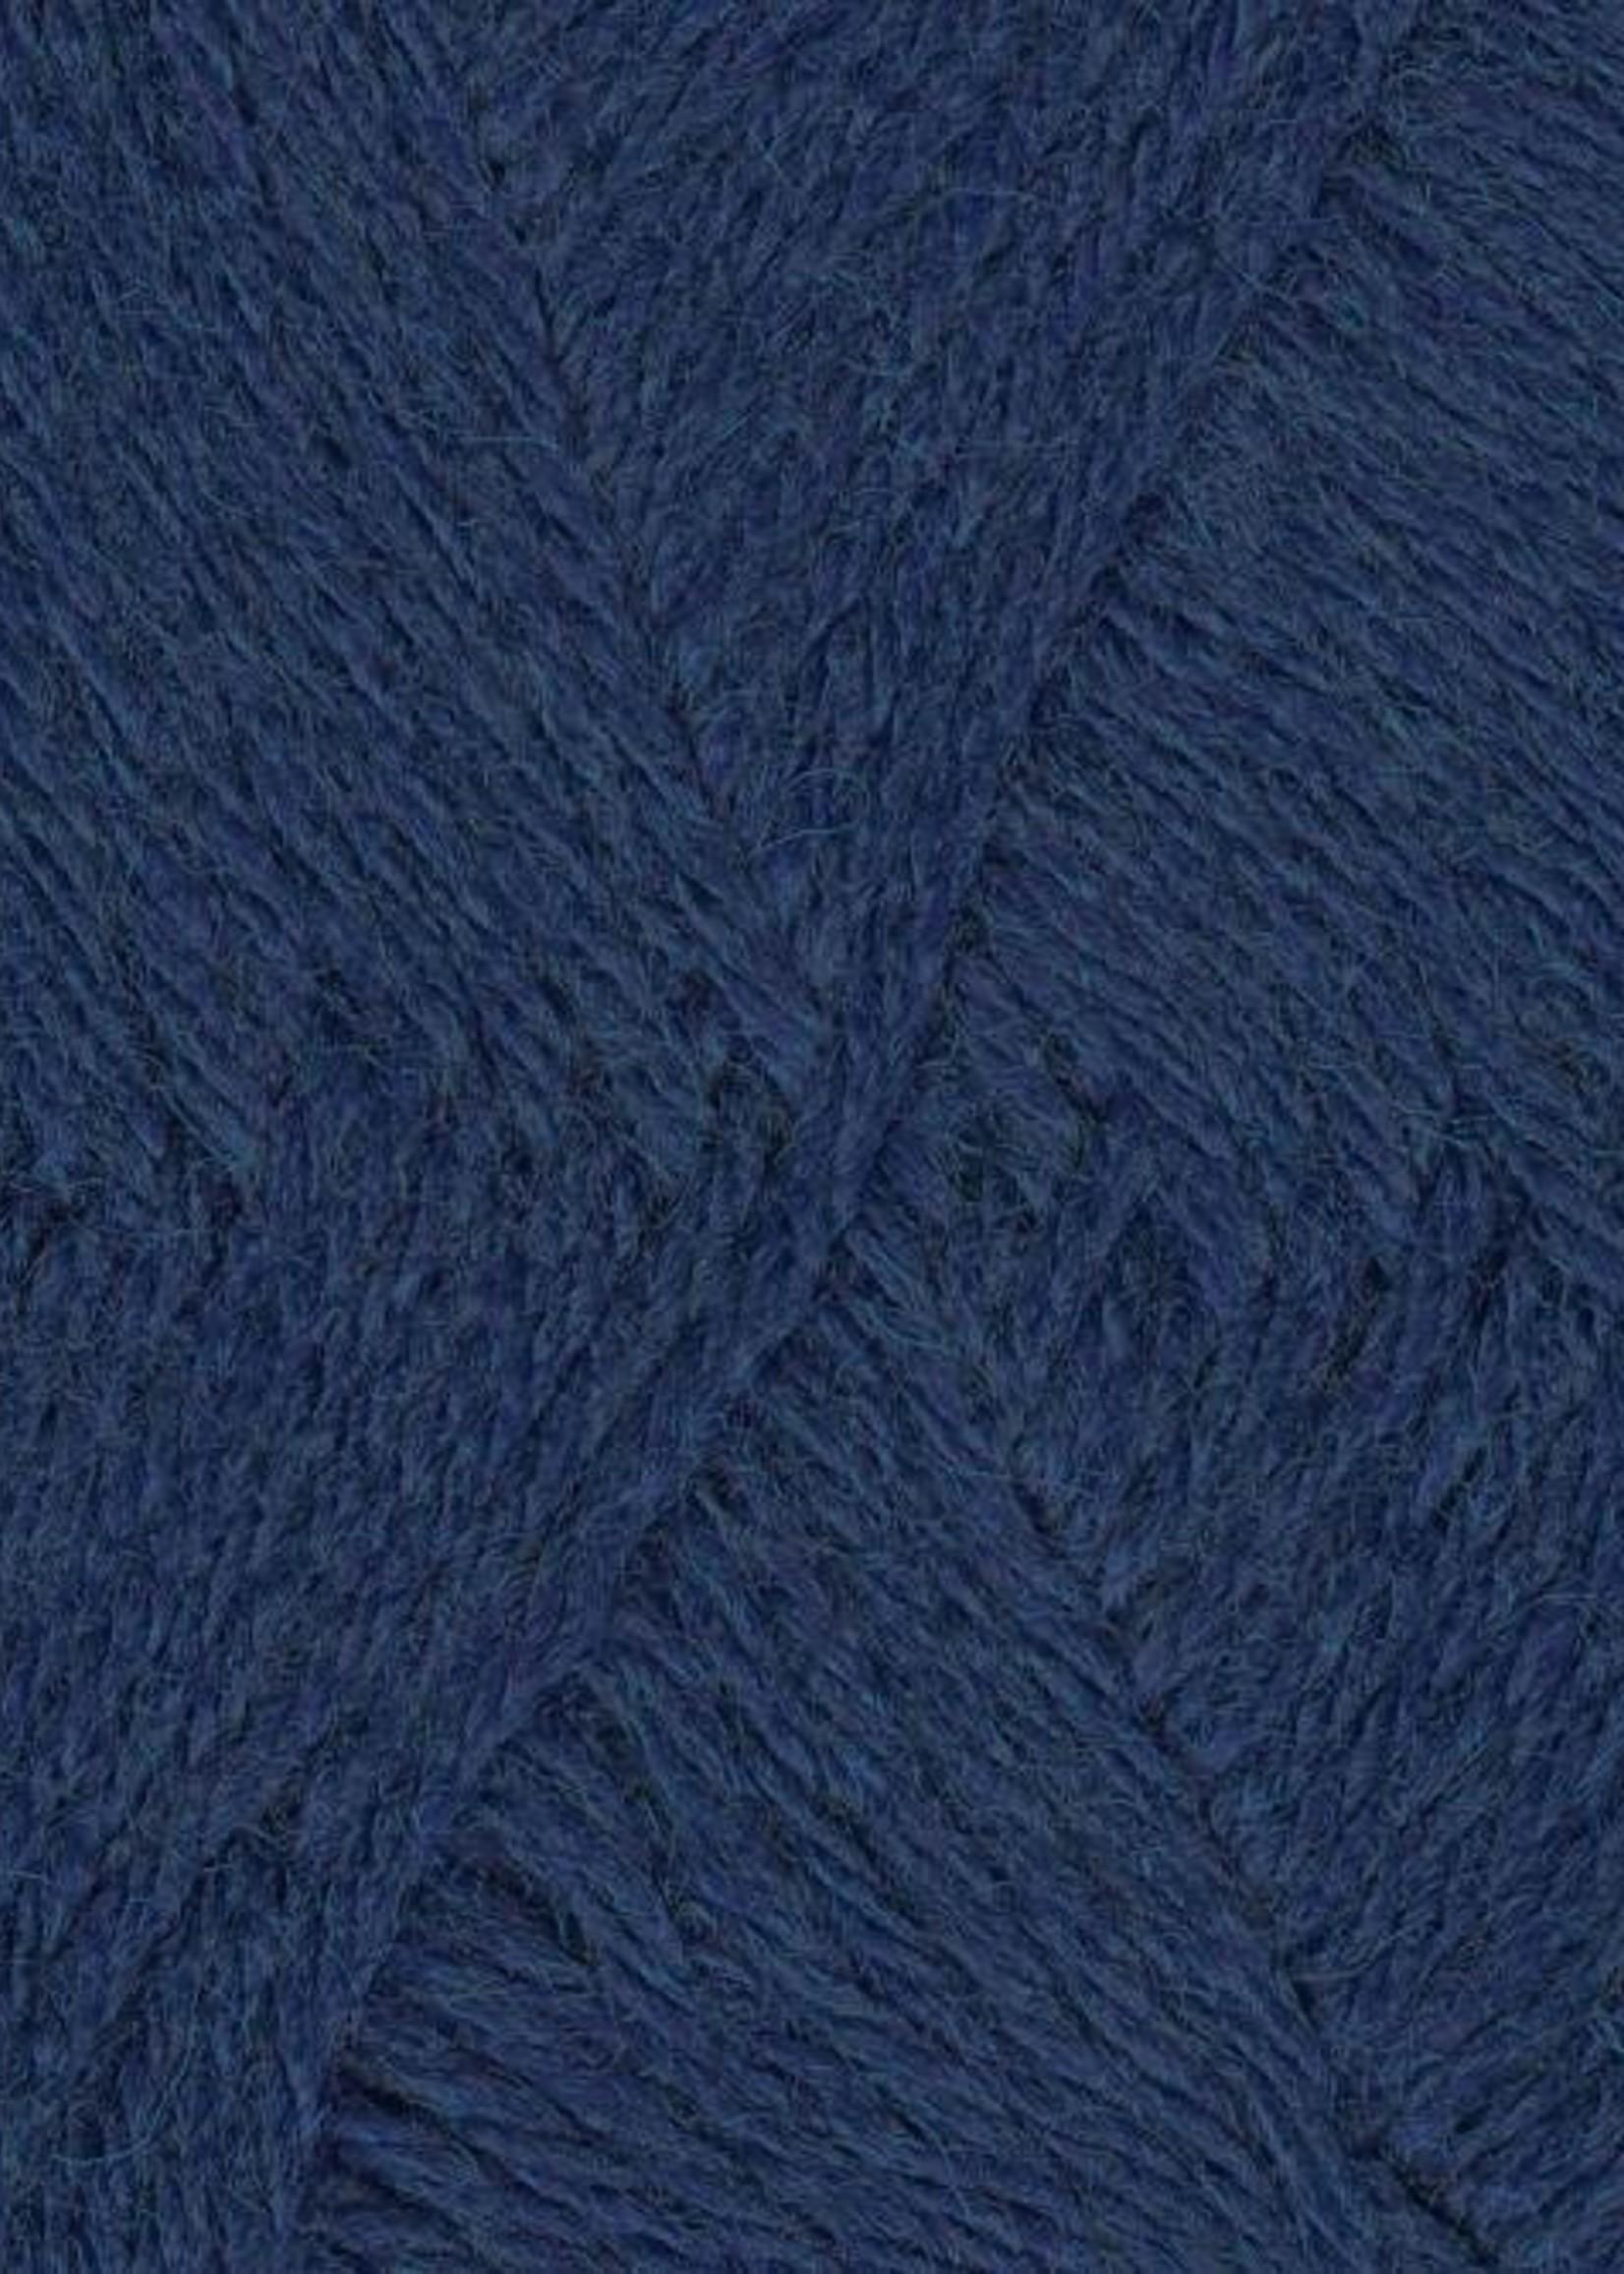 Knitting Fever KFI Collection Teenie Weenie Wool - Indigo